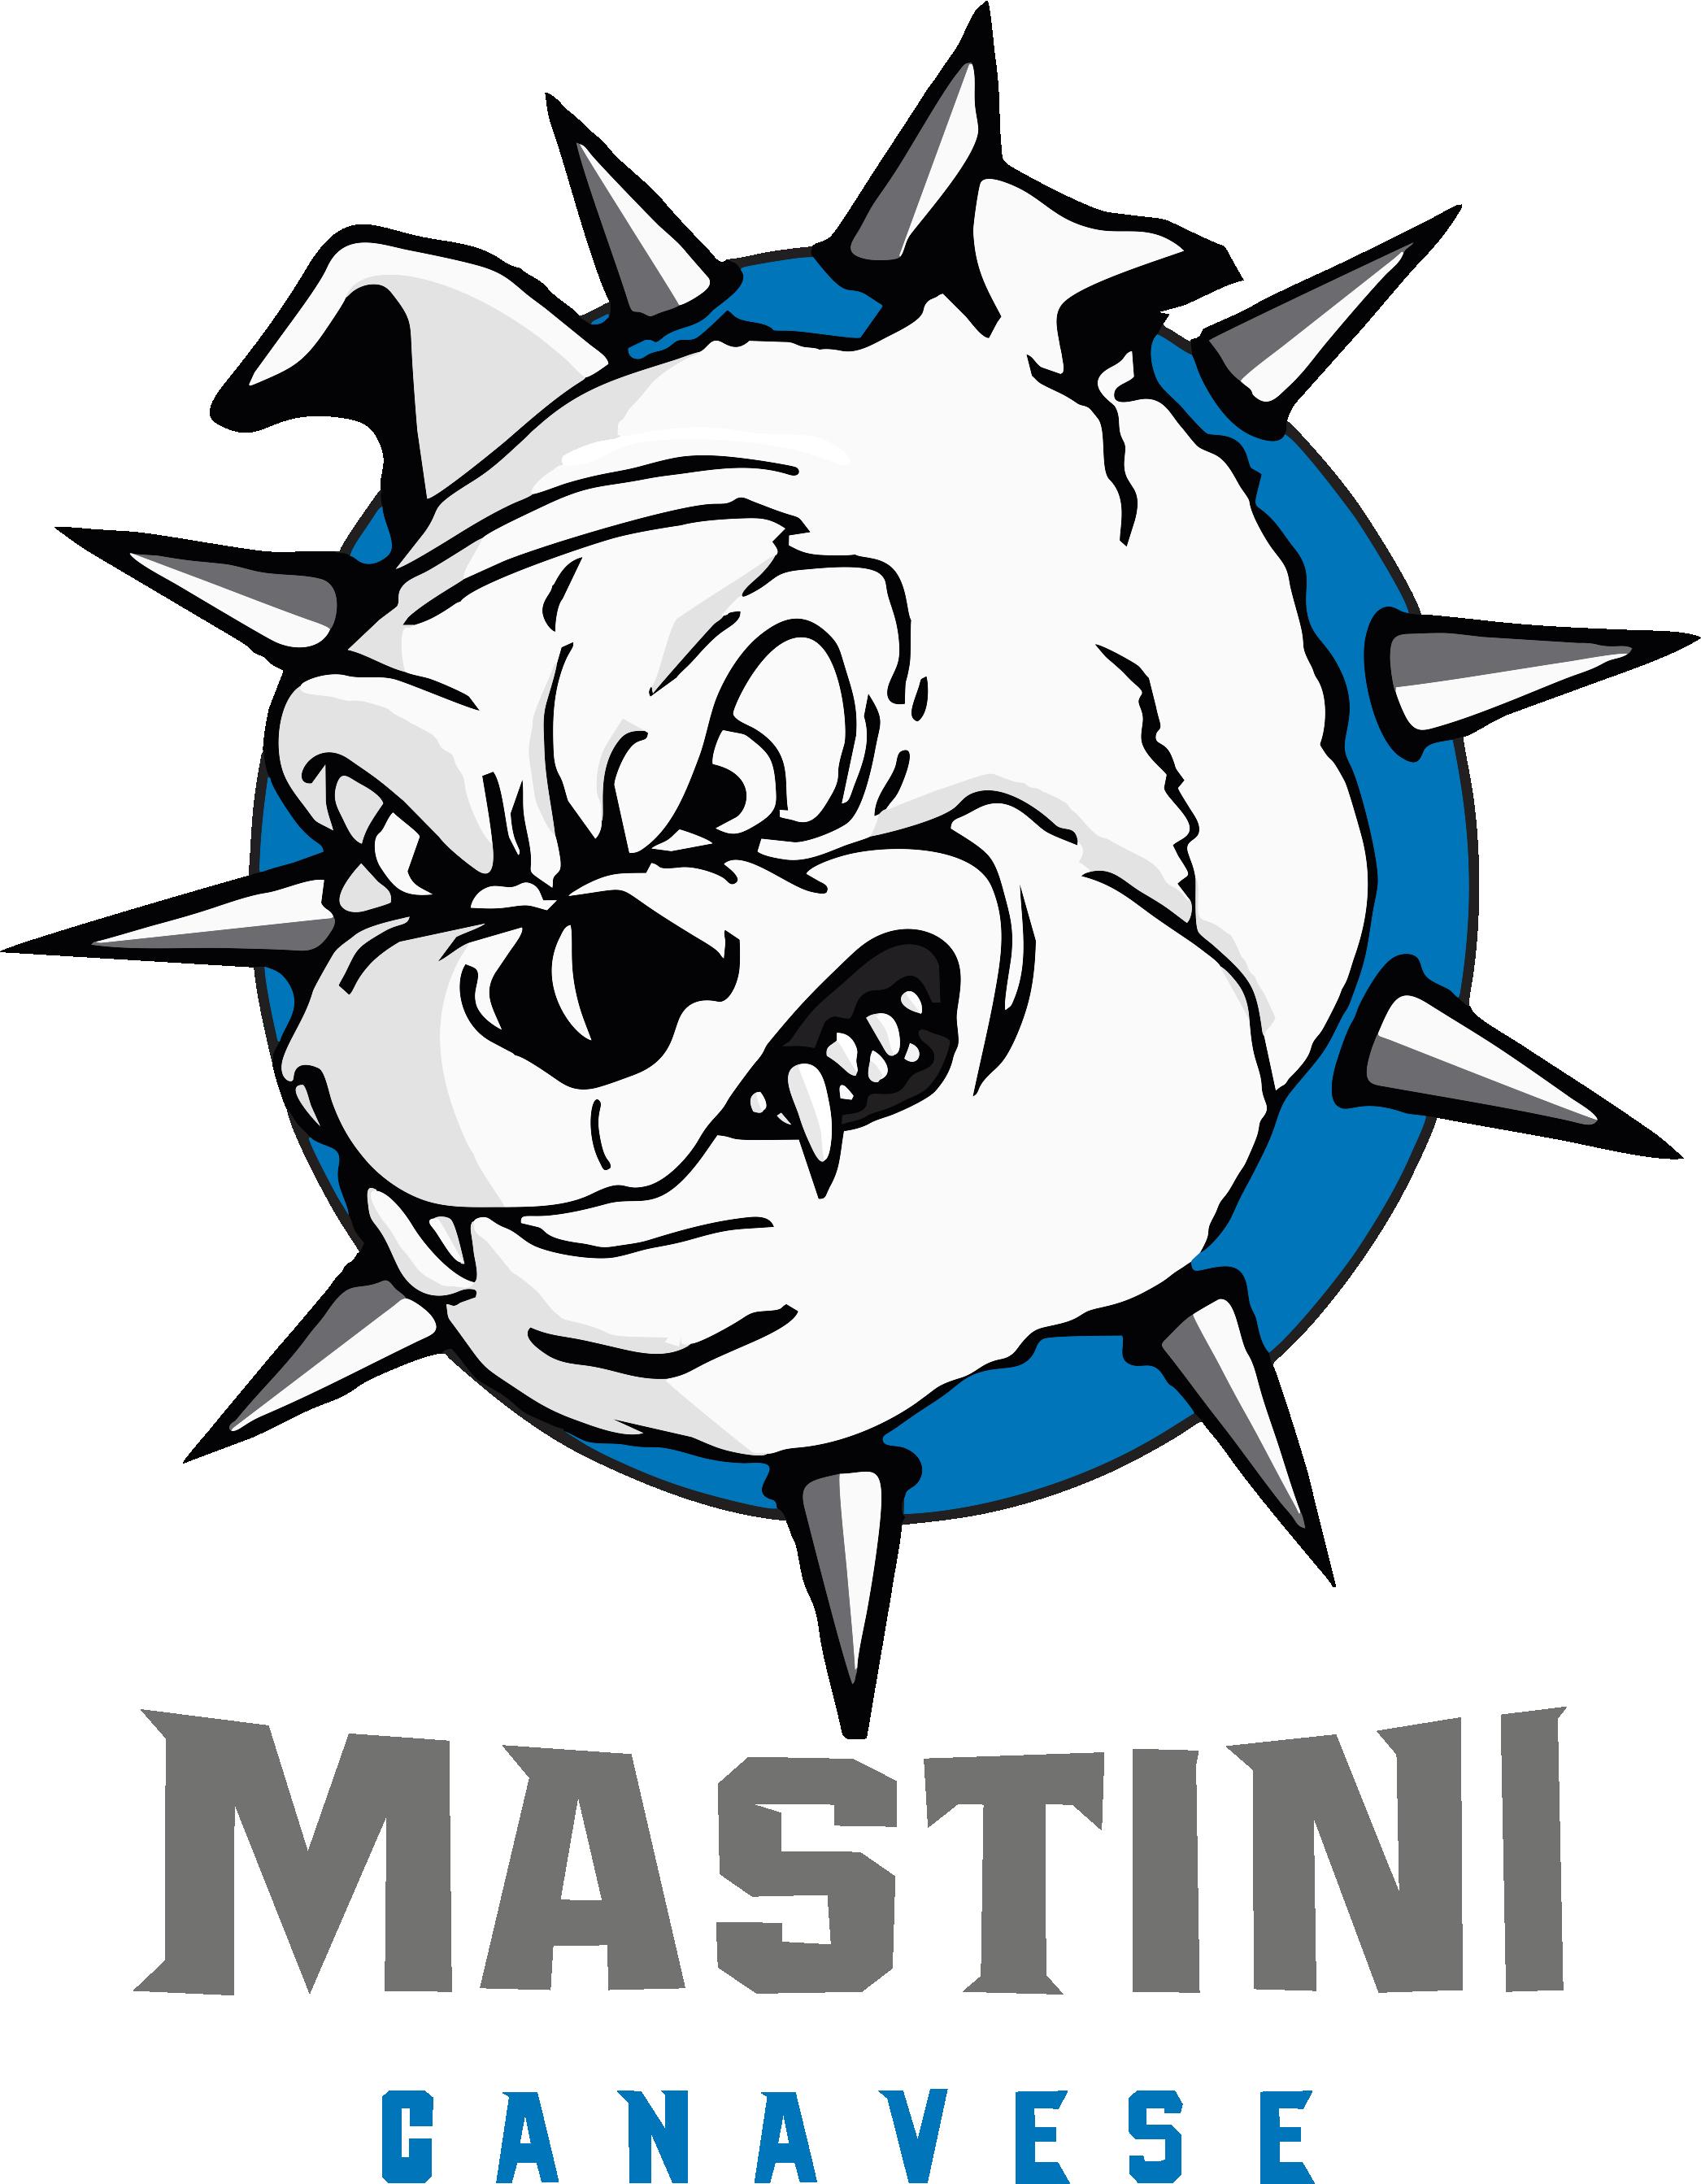 MASTINI CANAVESE